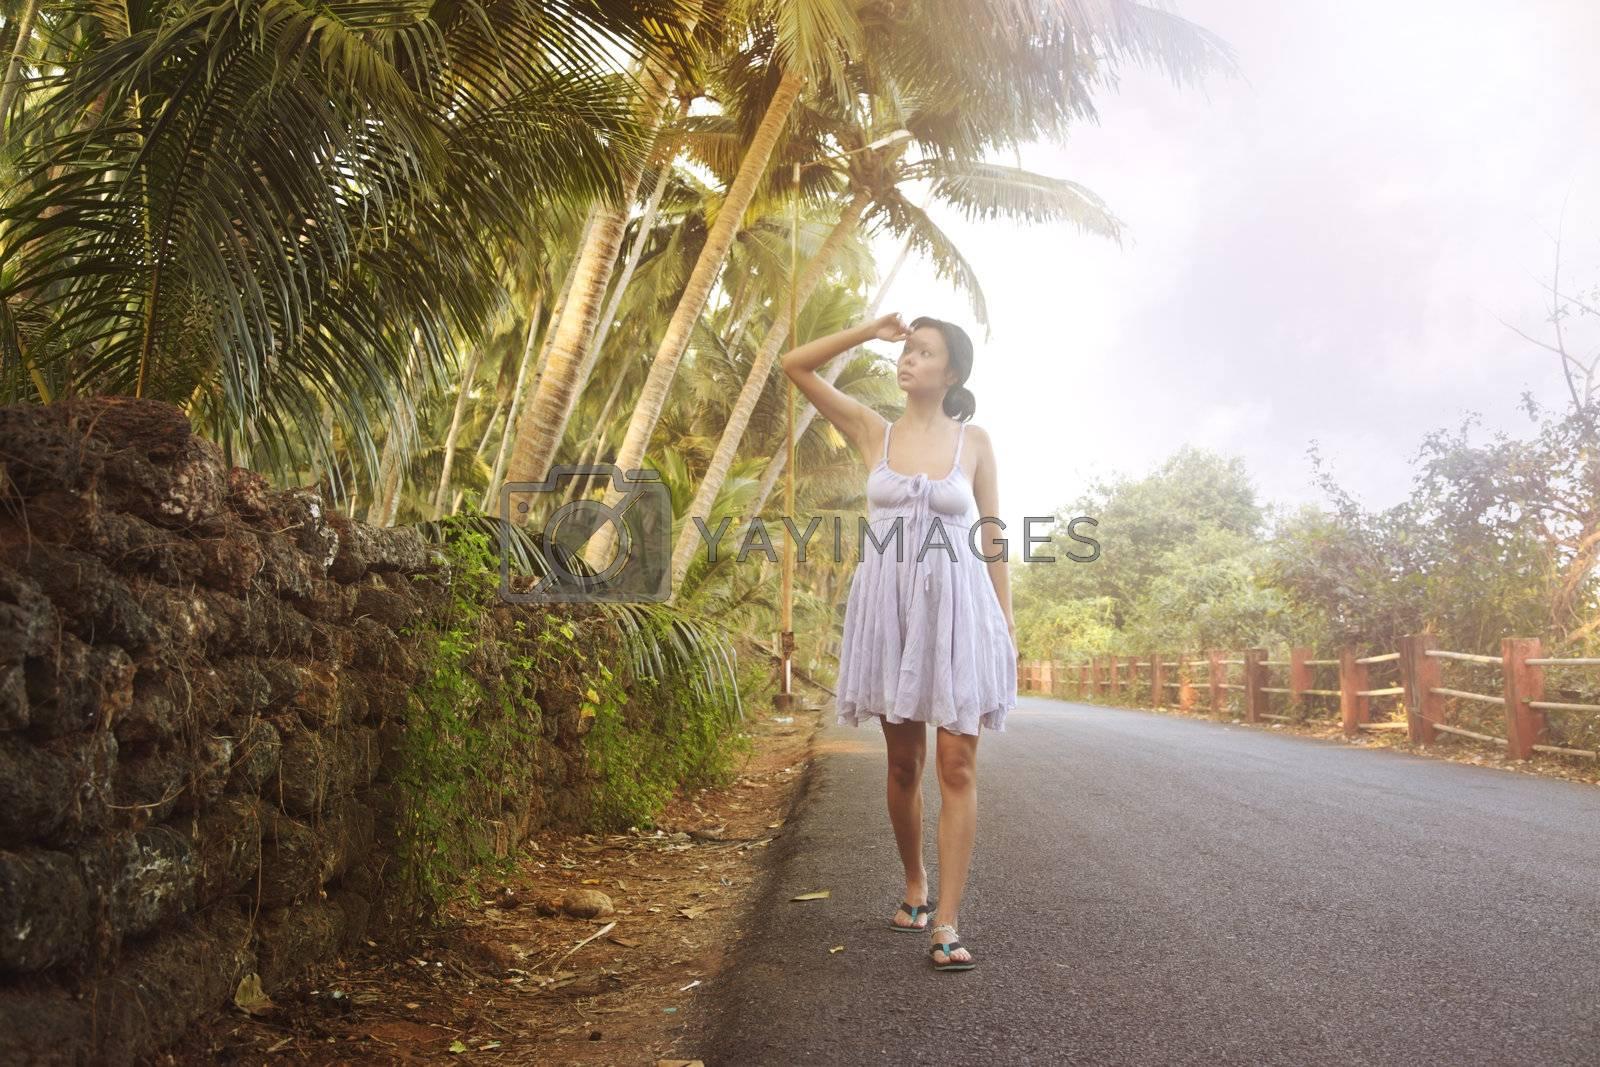 Lady walking in India street